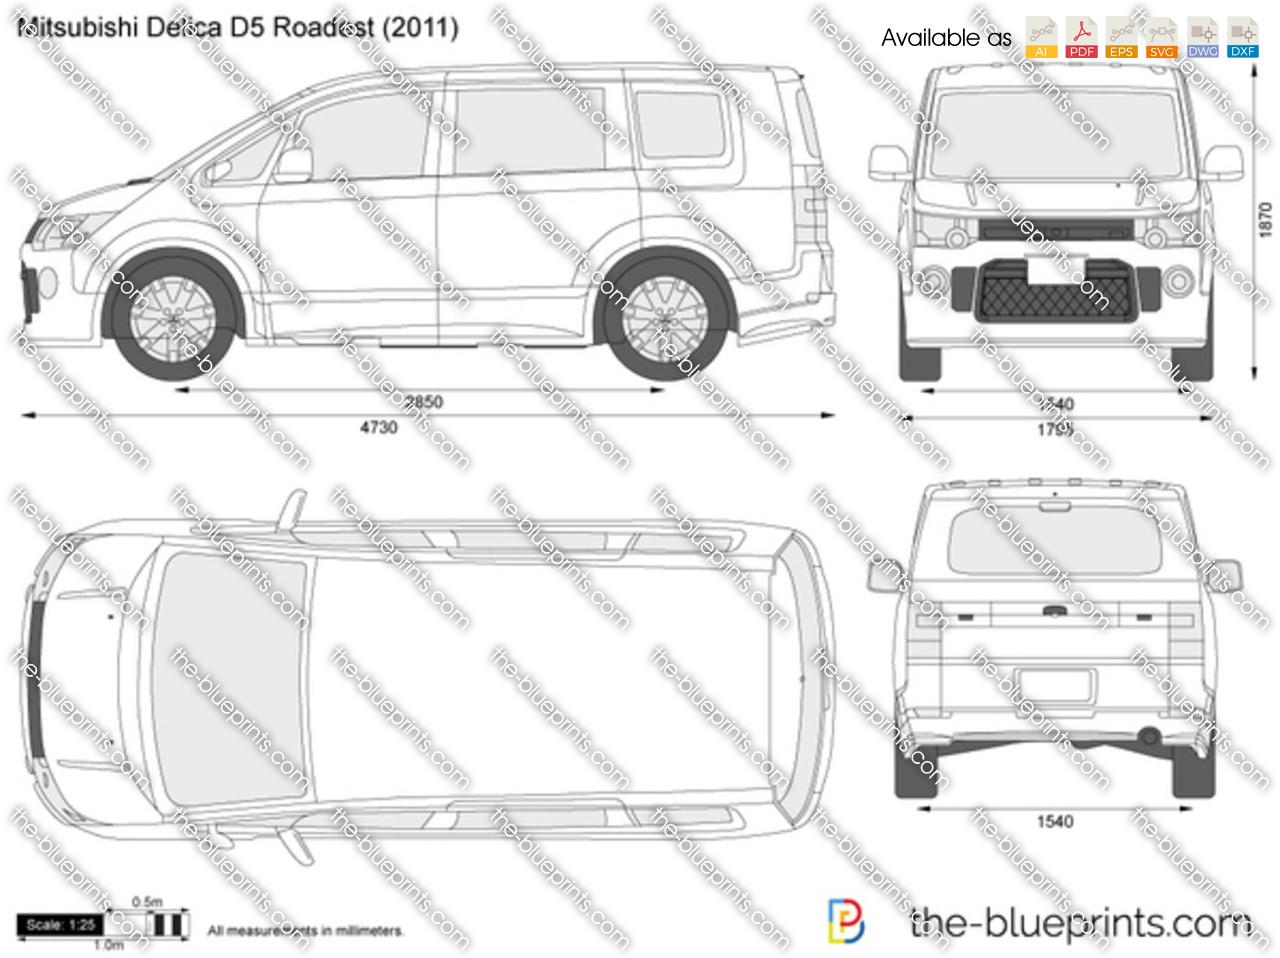 Mitsubishi Delica D5 Roadest Vector Drawing Wiring Schematic 2006 F250 Interior